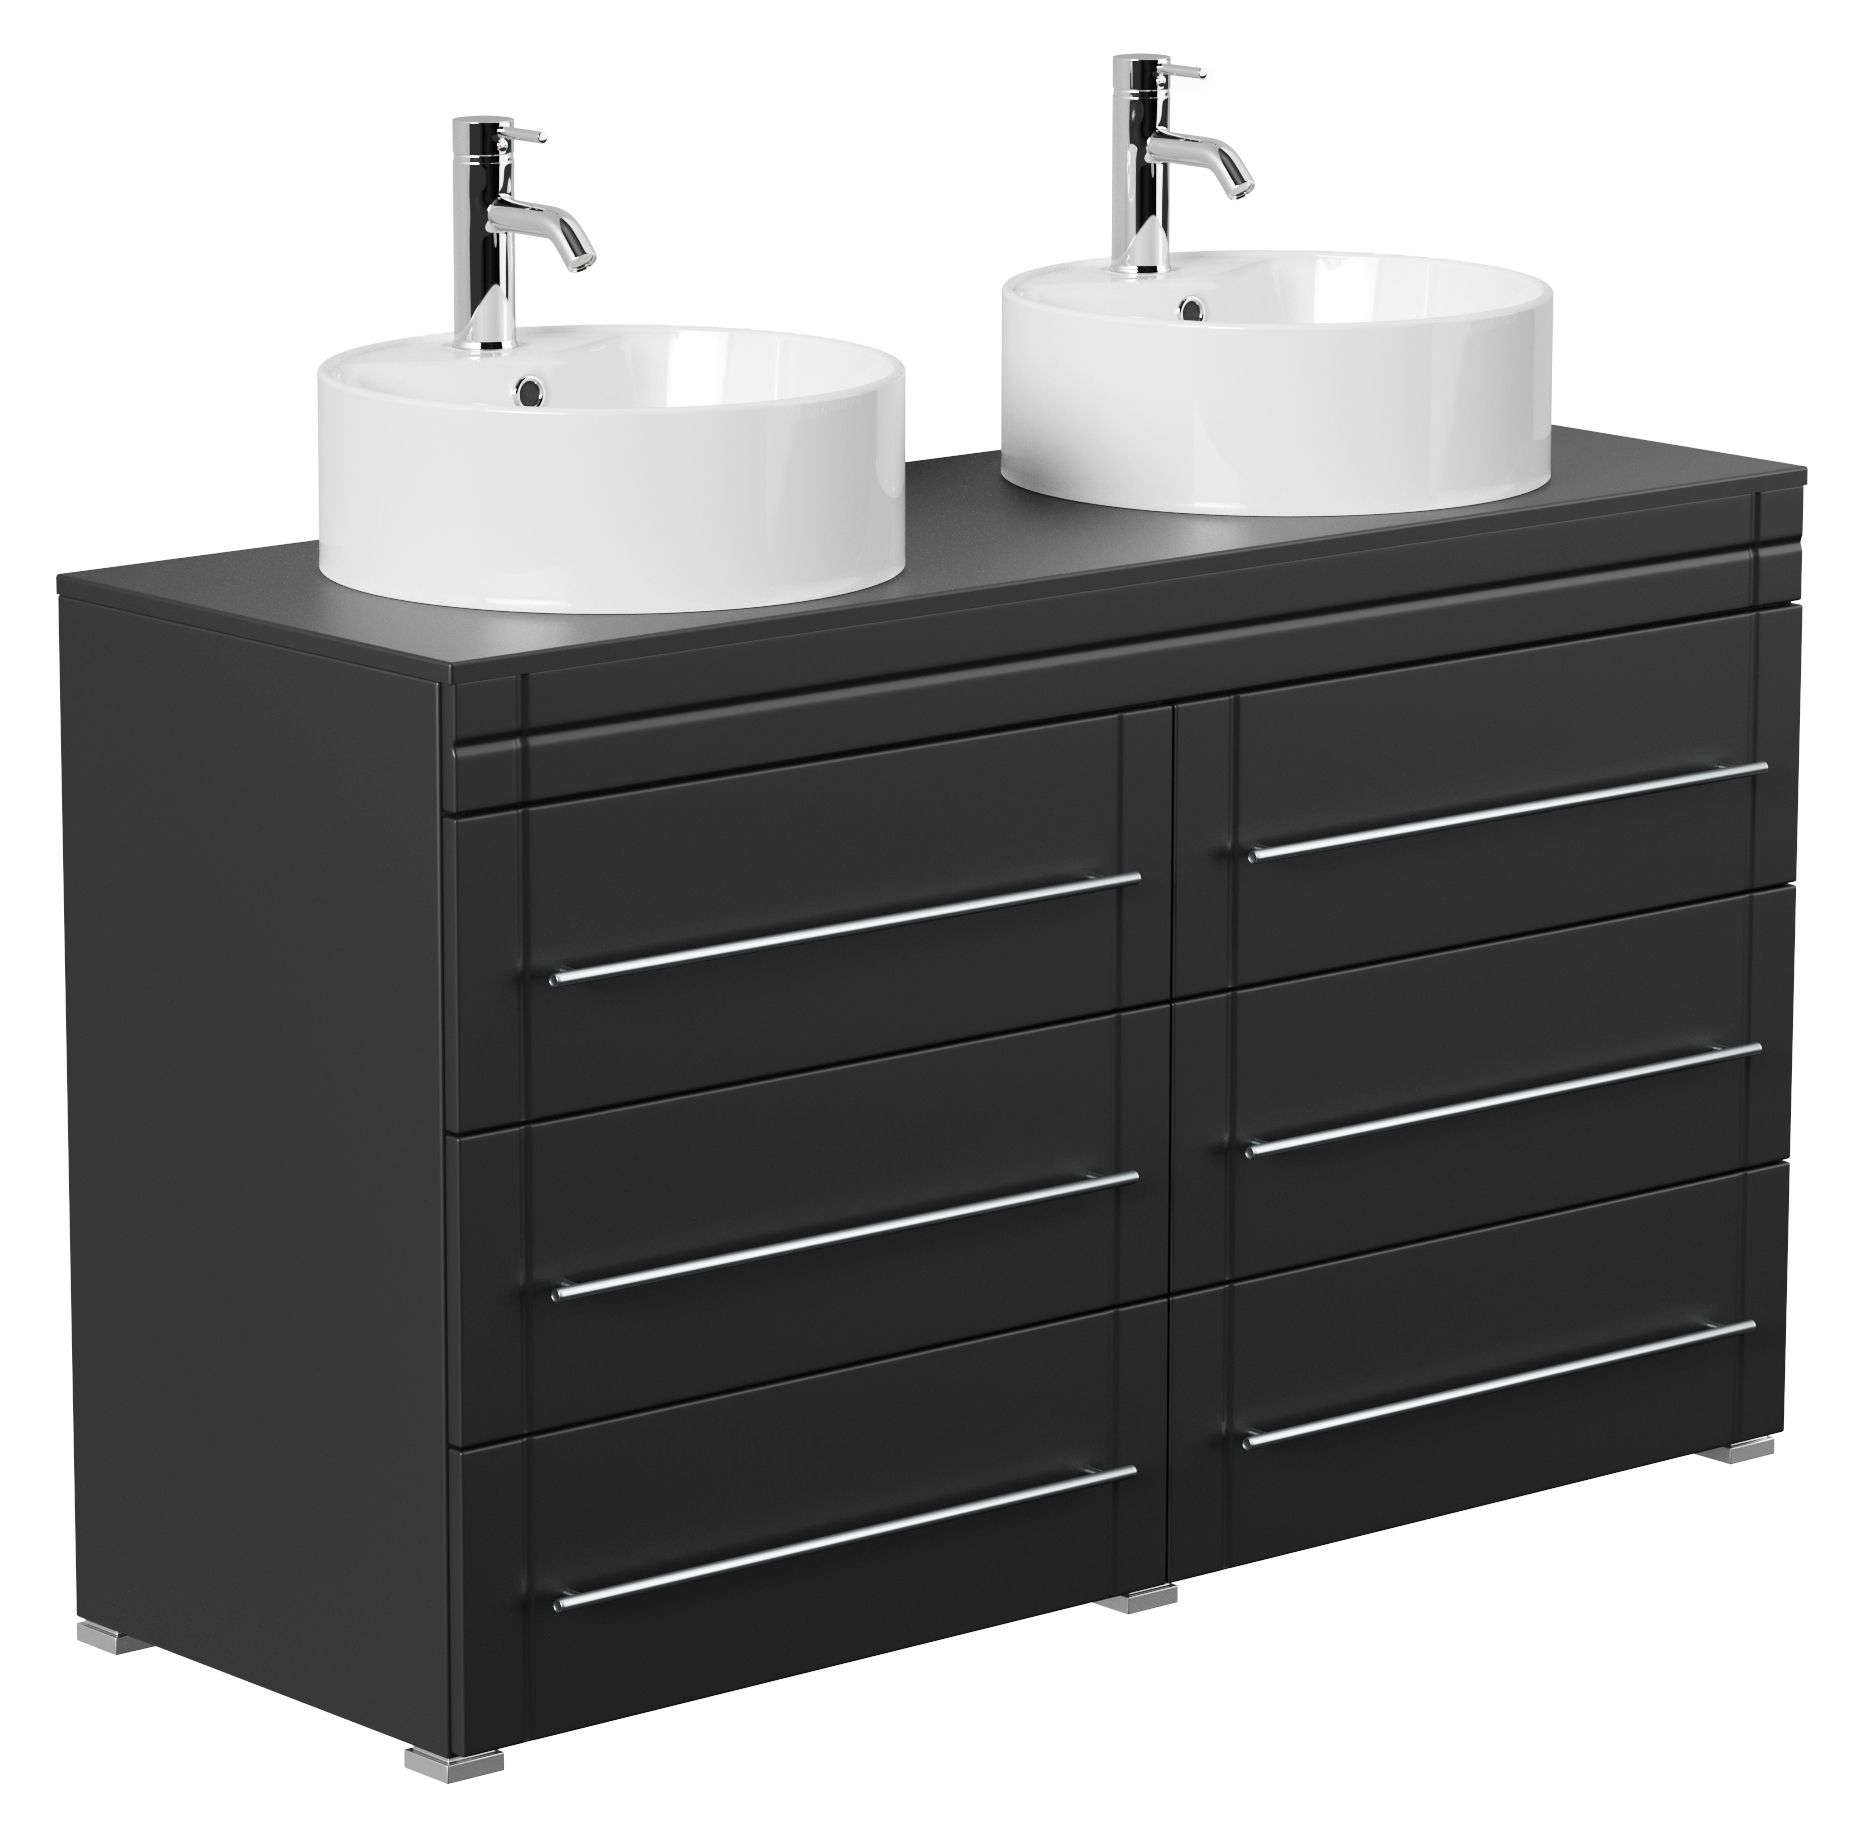 14+ Meuble pour vasque salle de bain trends